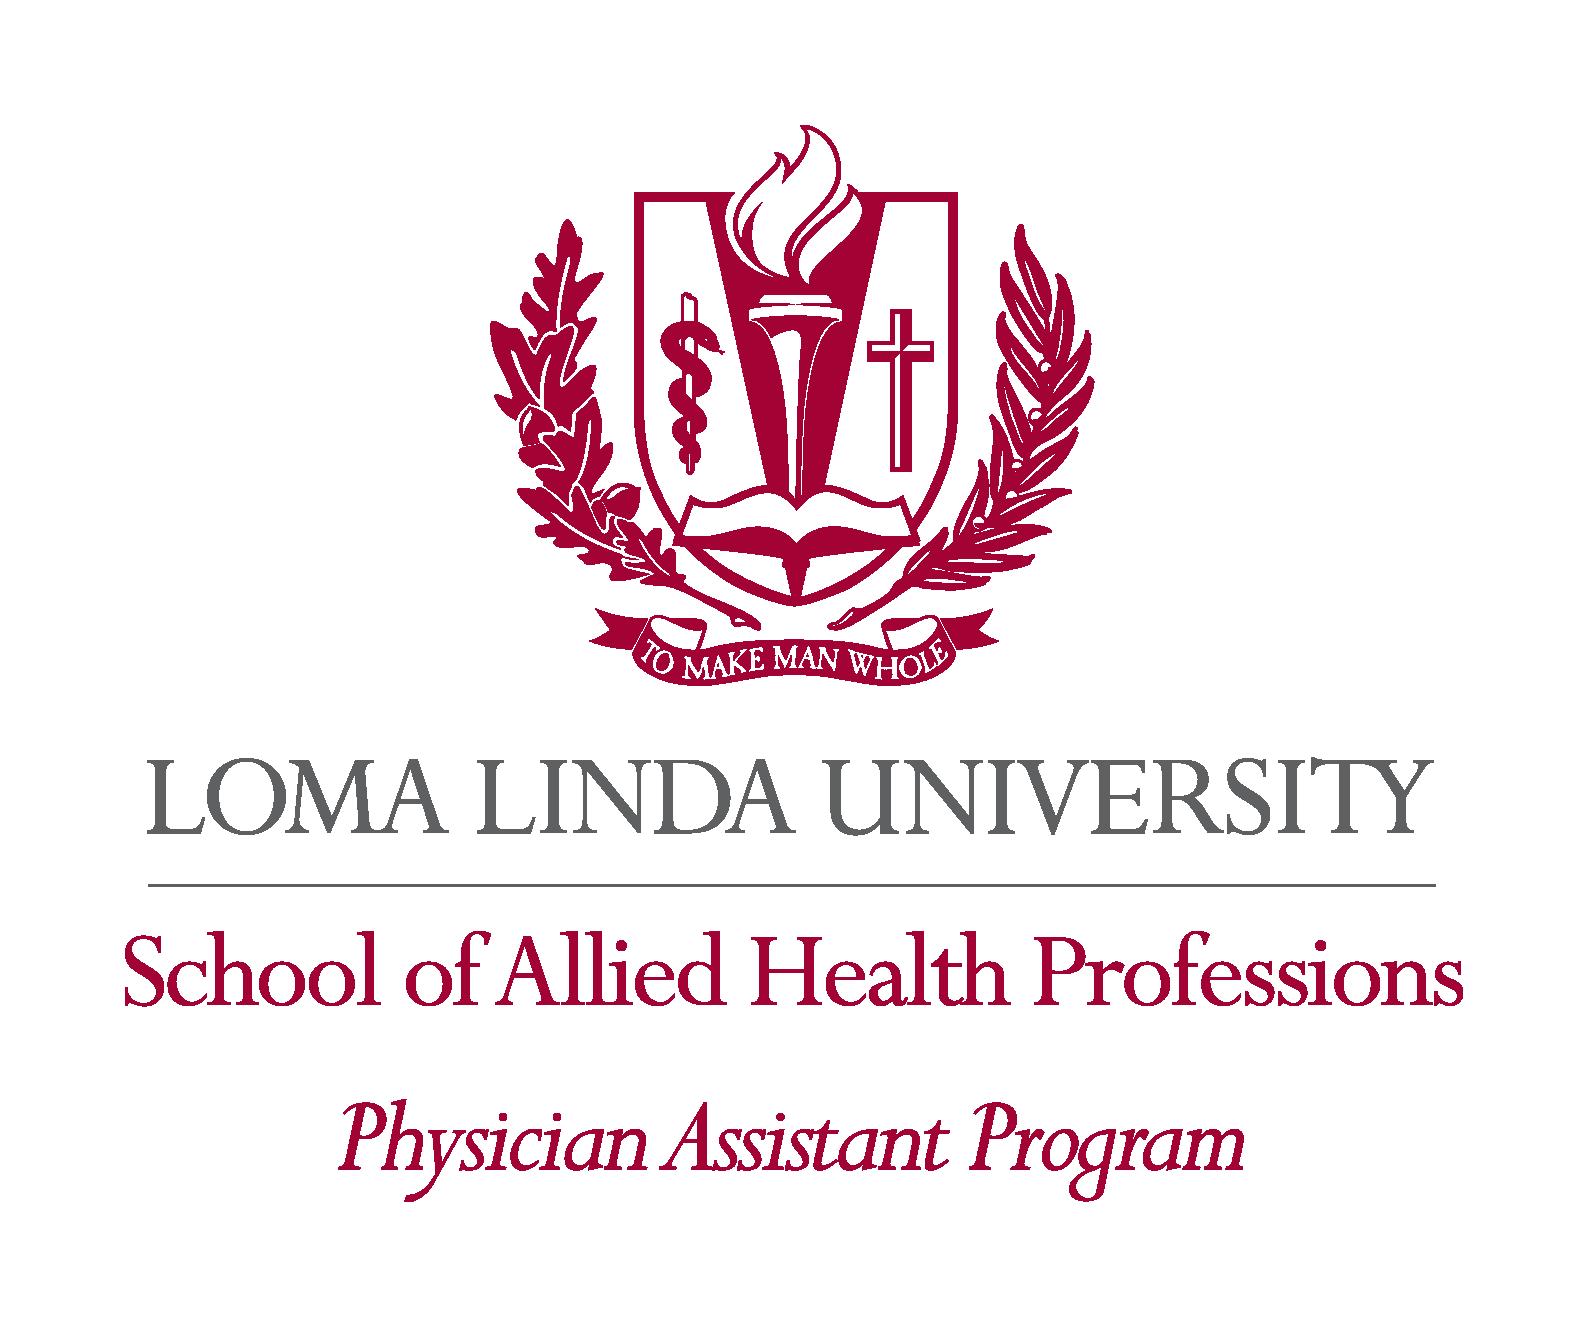 Loma Linda University Masters of Physician Assistant Program